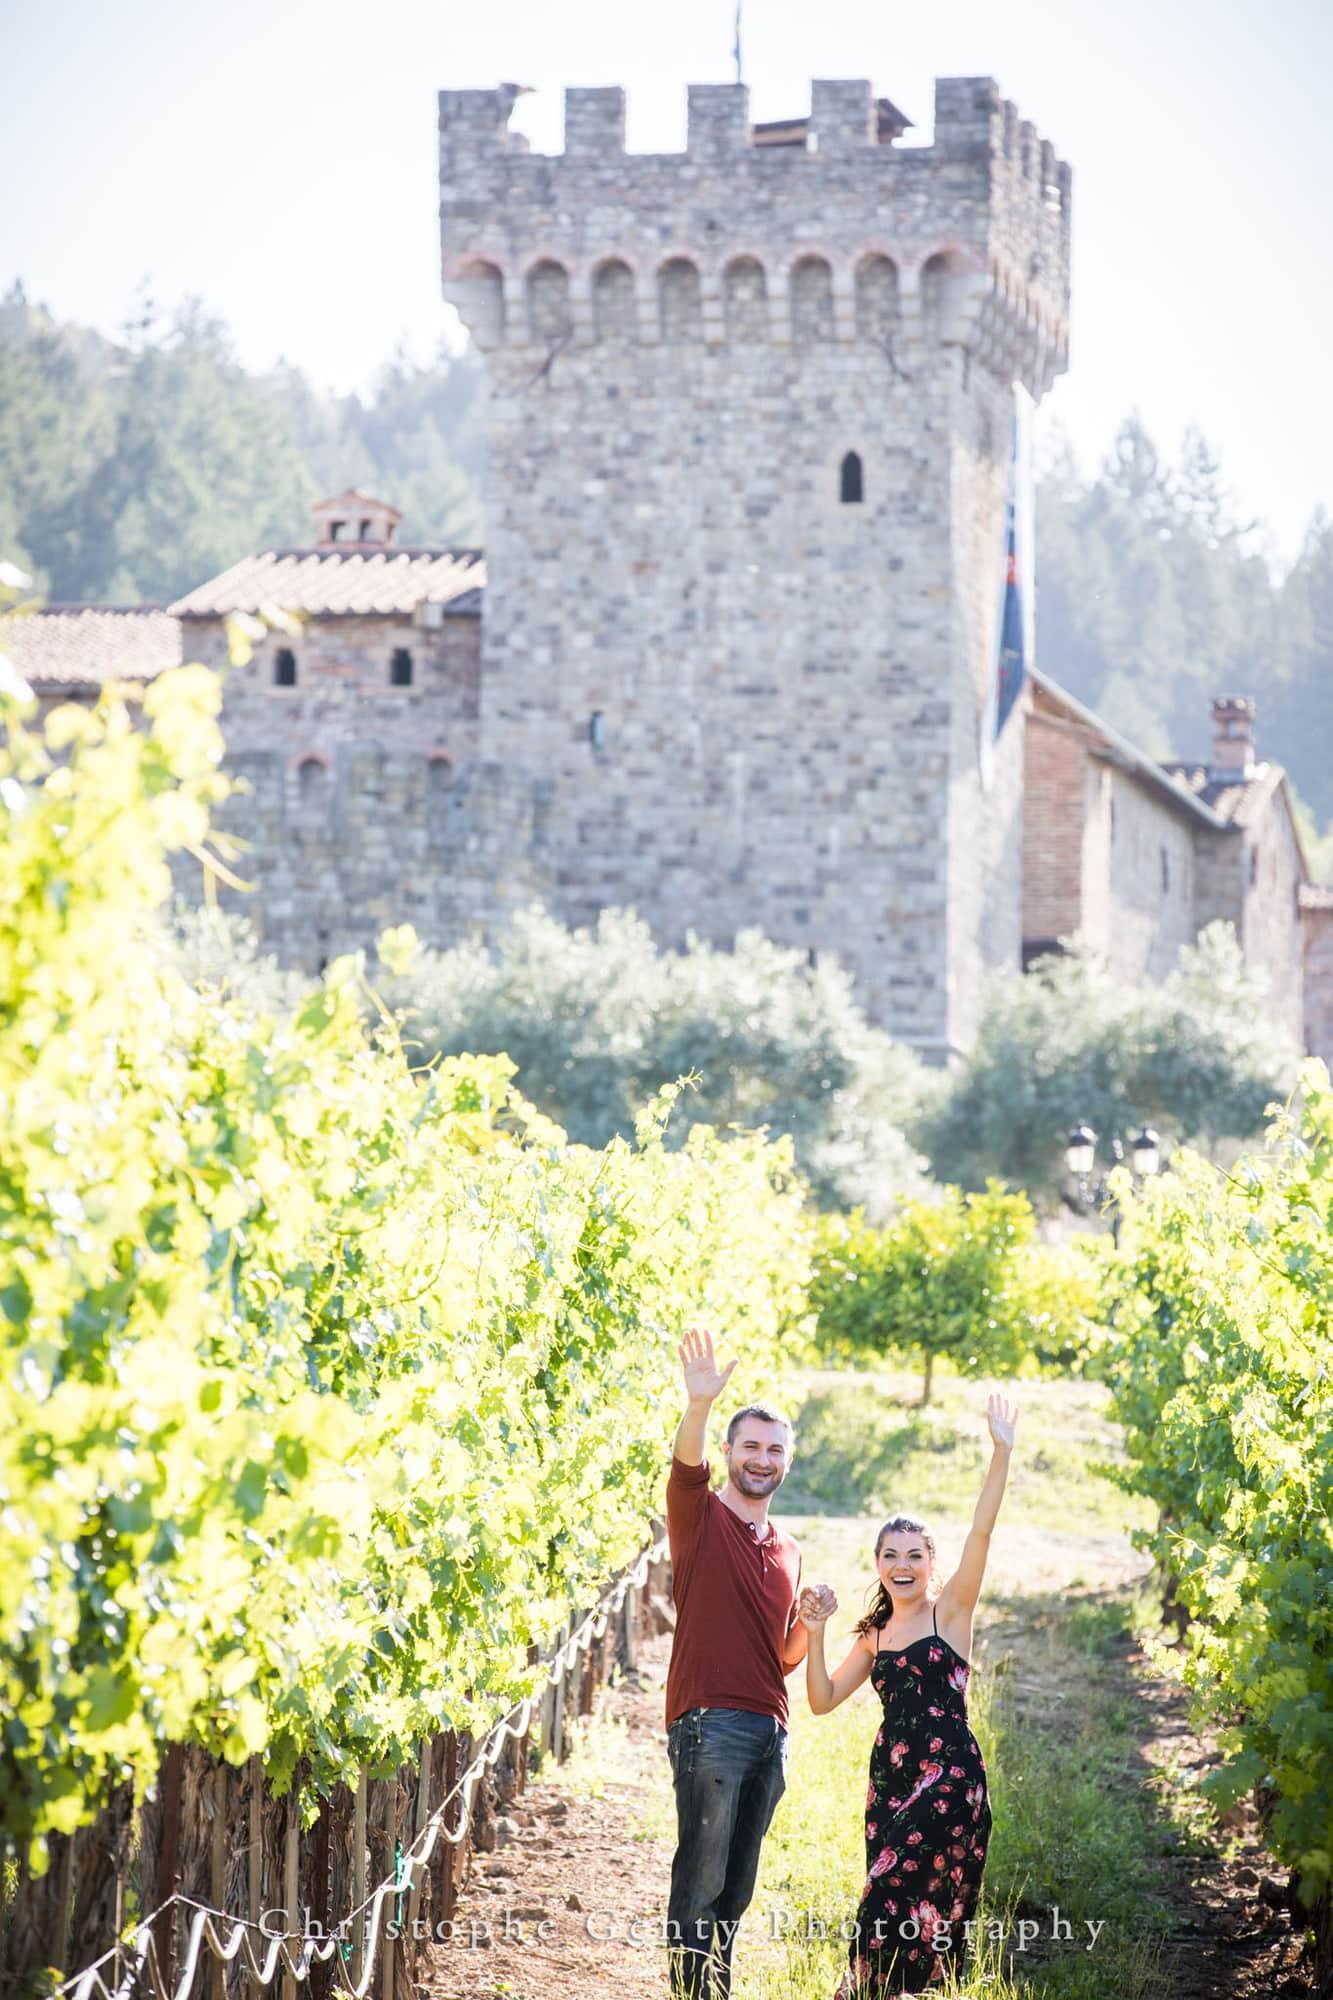 Castello di Amorosa Marriage Proposal Photography 304